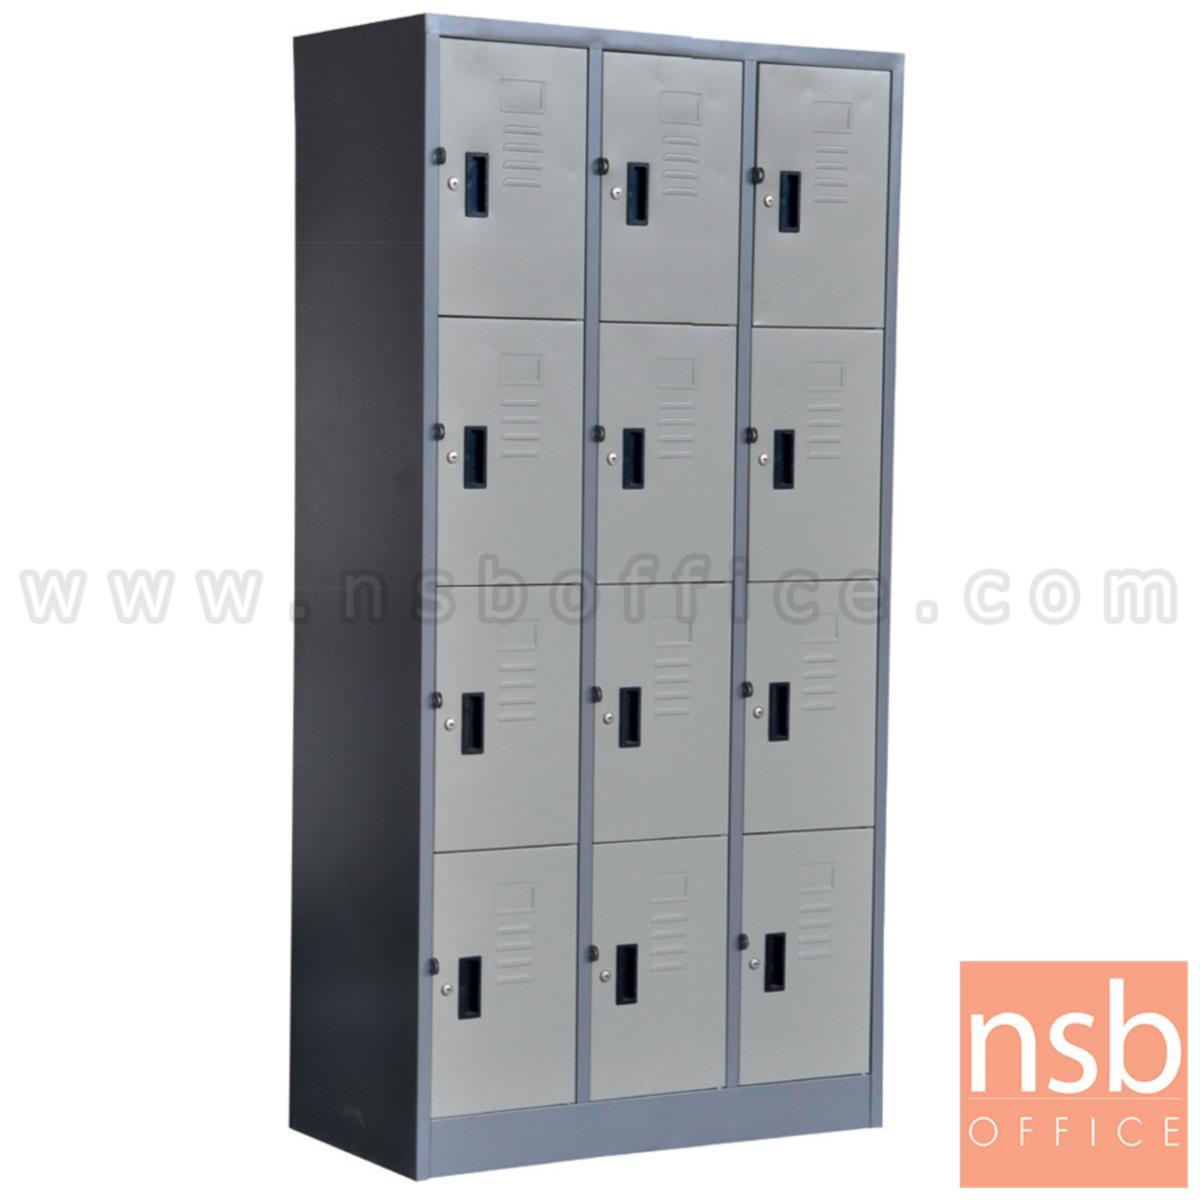 E08A008:ตู้ล็อกเกอร์ 12 ประตู  รุ่น Seth (เซธ)  ขนาด 91W*45D*182H cm.